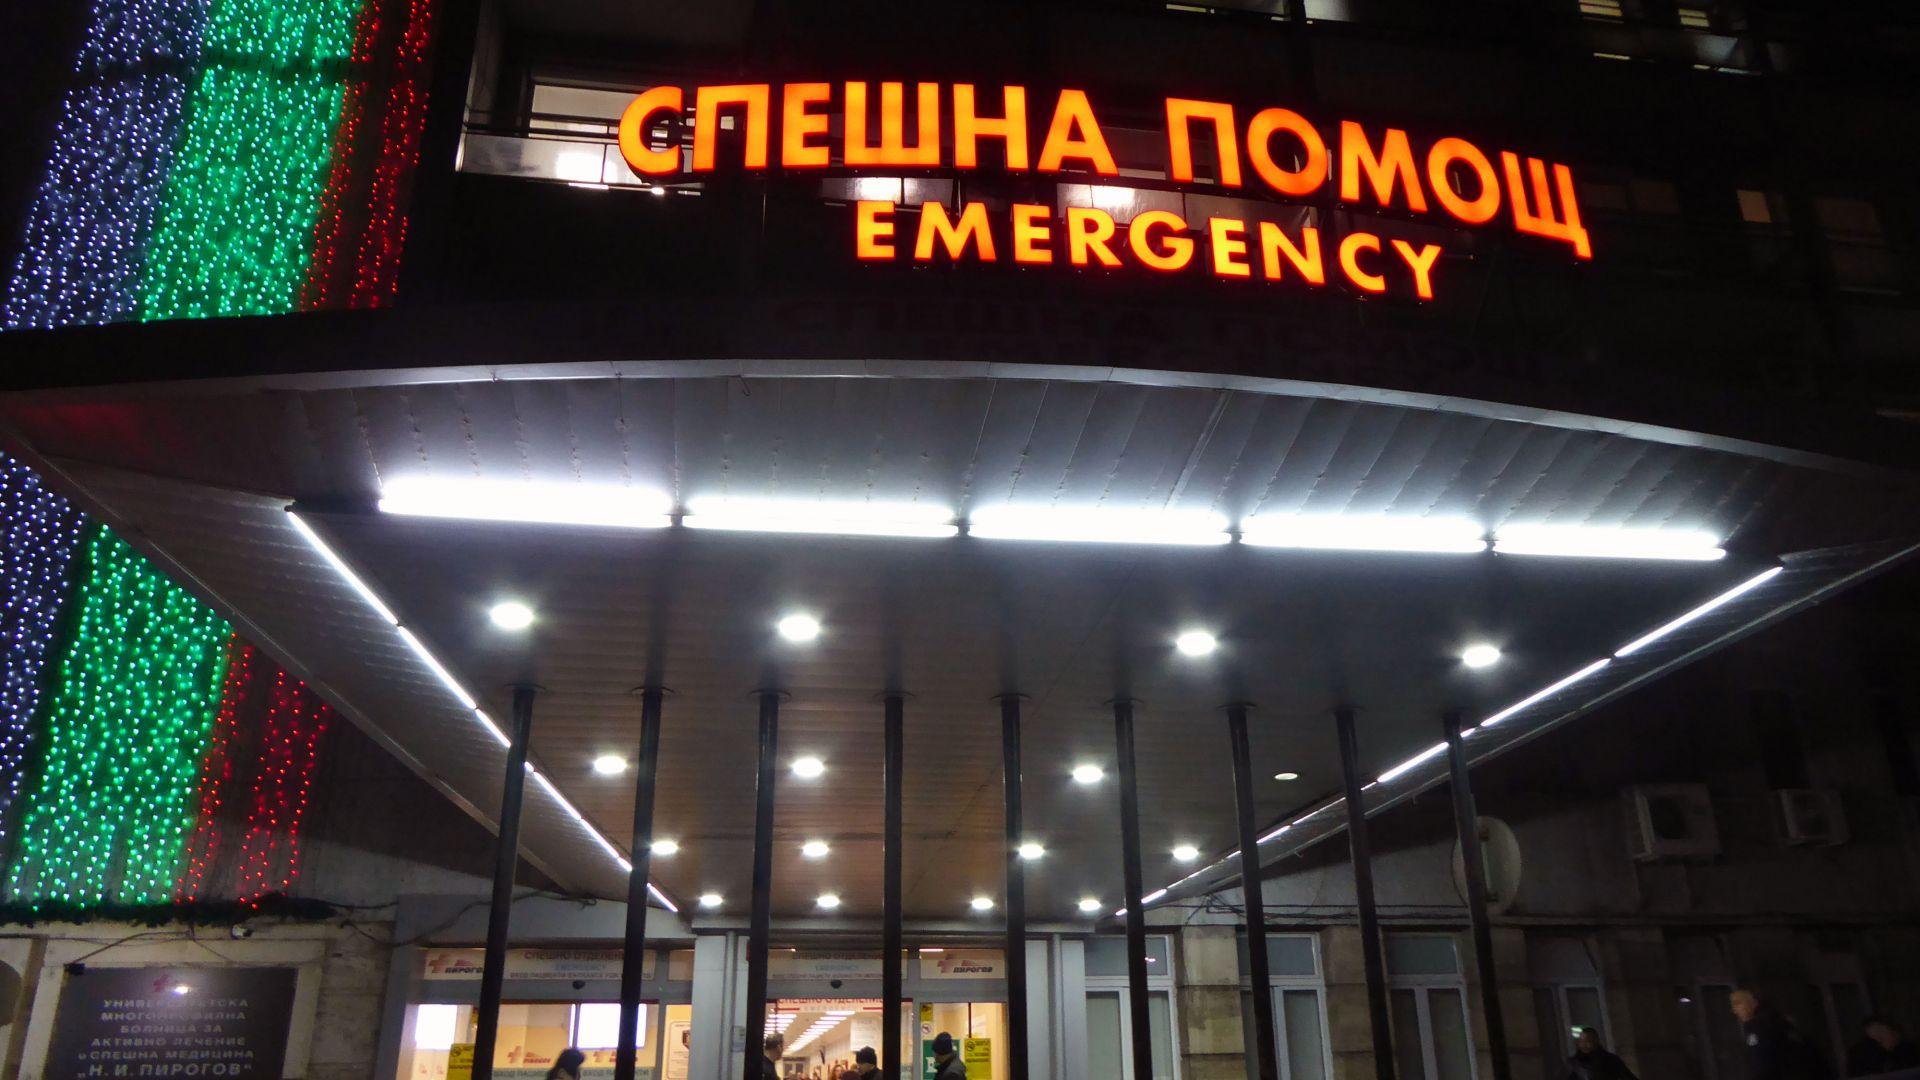 160 човека са преминали през спешния травматологичен кабинет на УМБАЛСМ